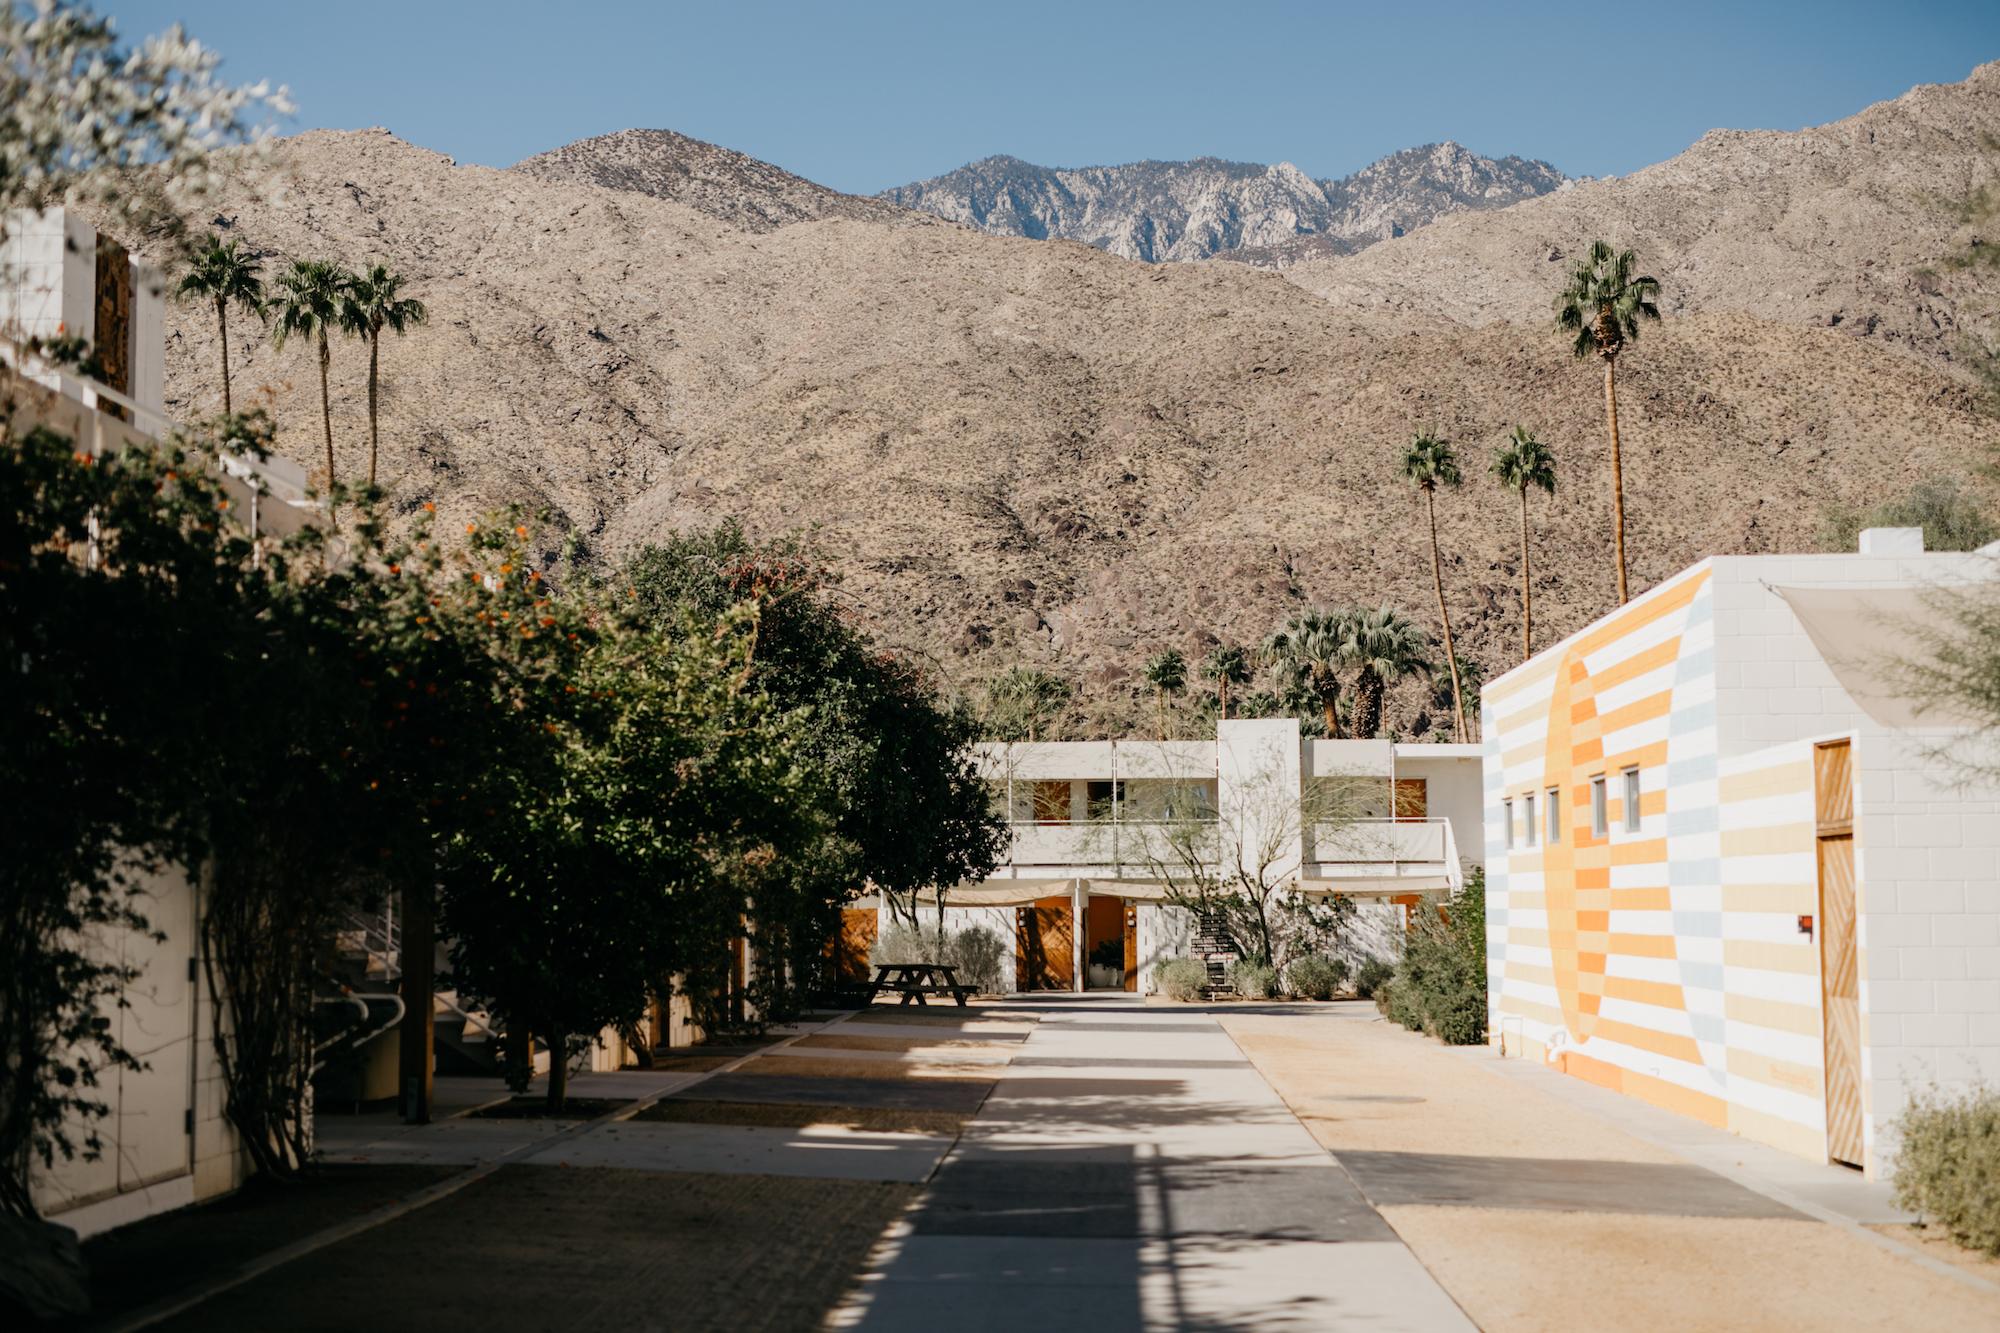 ace-hotel-palm-springs-wedding-photographer005.jpg